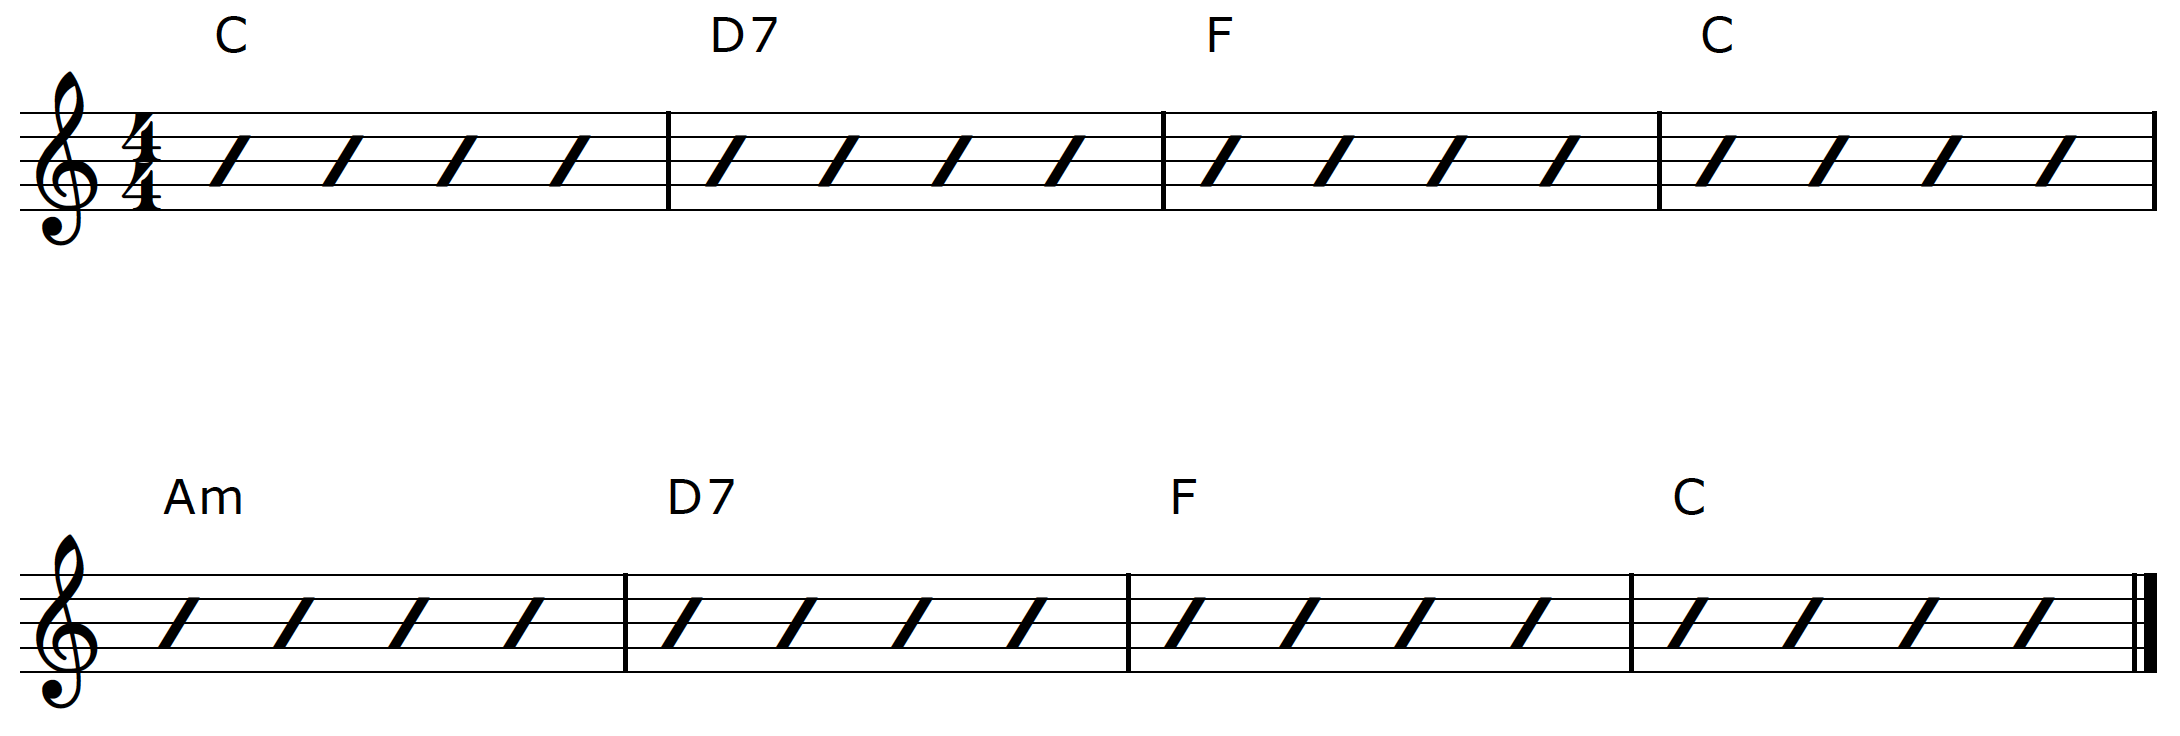 Creative-Fingerpicking-Guitar-Chord-Progression